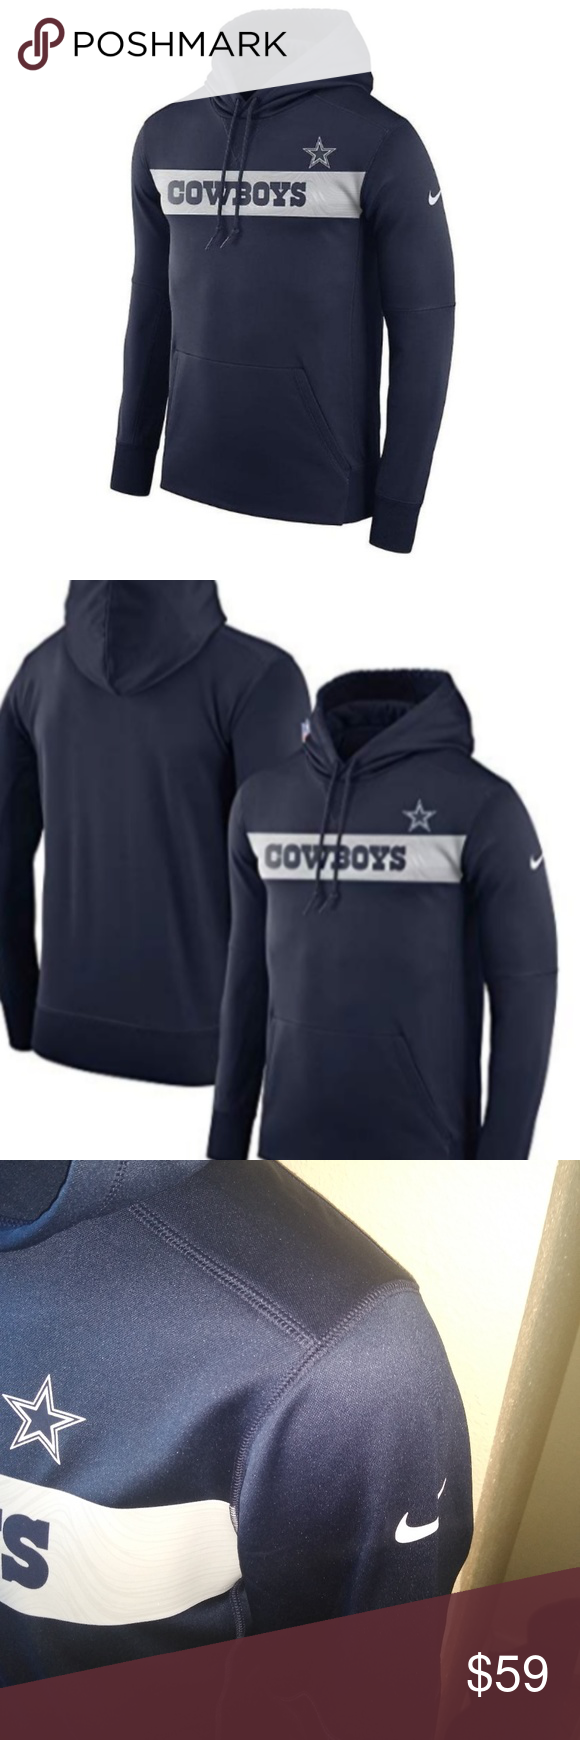 Dallas Cowboys Nike Therma Dri Fit Unisex Hoodie Dallas Cowboys Nike Therma Dri Fit Unisex Hoodie Creative A Fantastic Gi Unisex Hoodies Hoodies Unisex Shirts [ 1740 x 580 Pixel ]